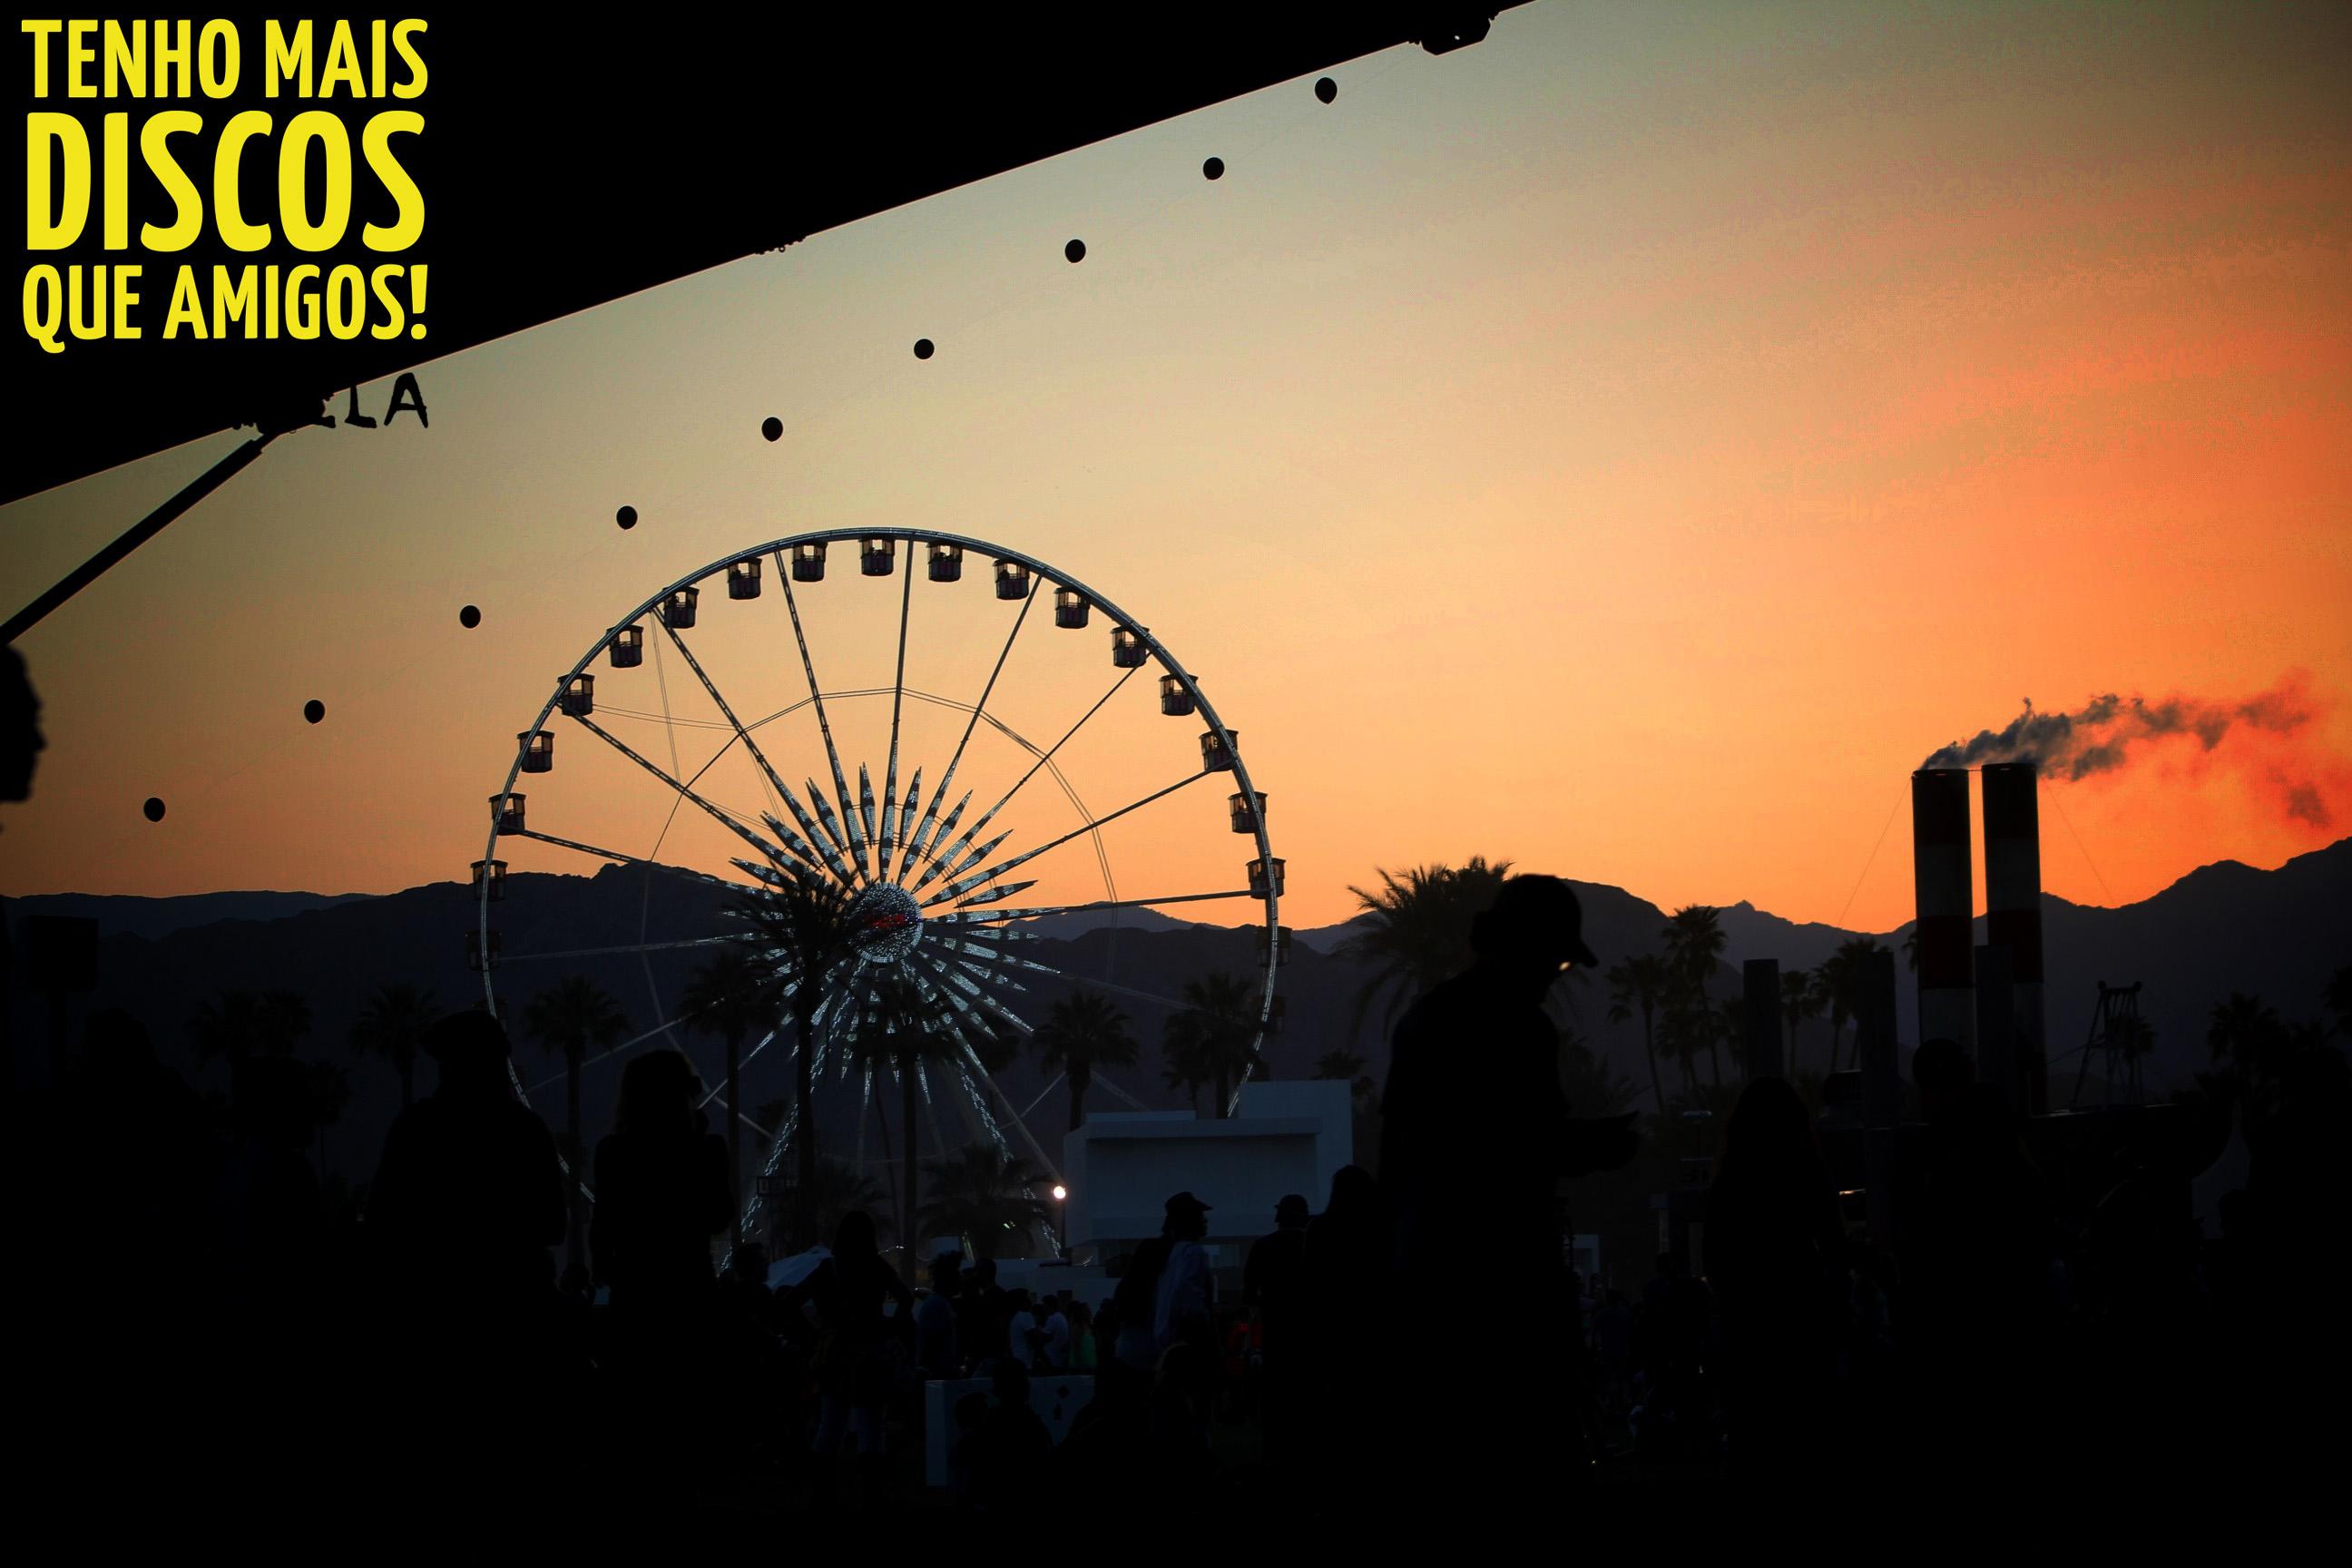 Coachella Confirma Datas Para Edicao De 2014 Tenho Mais Discos Que Amigos